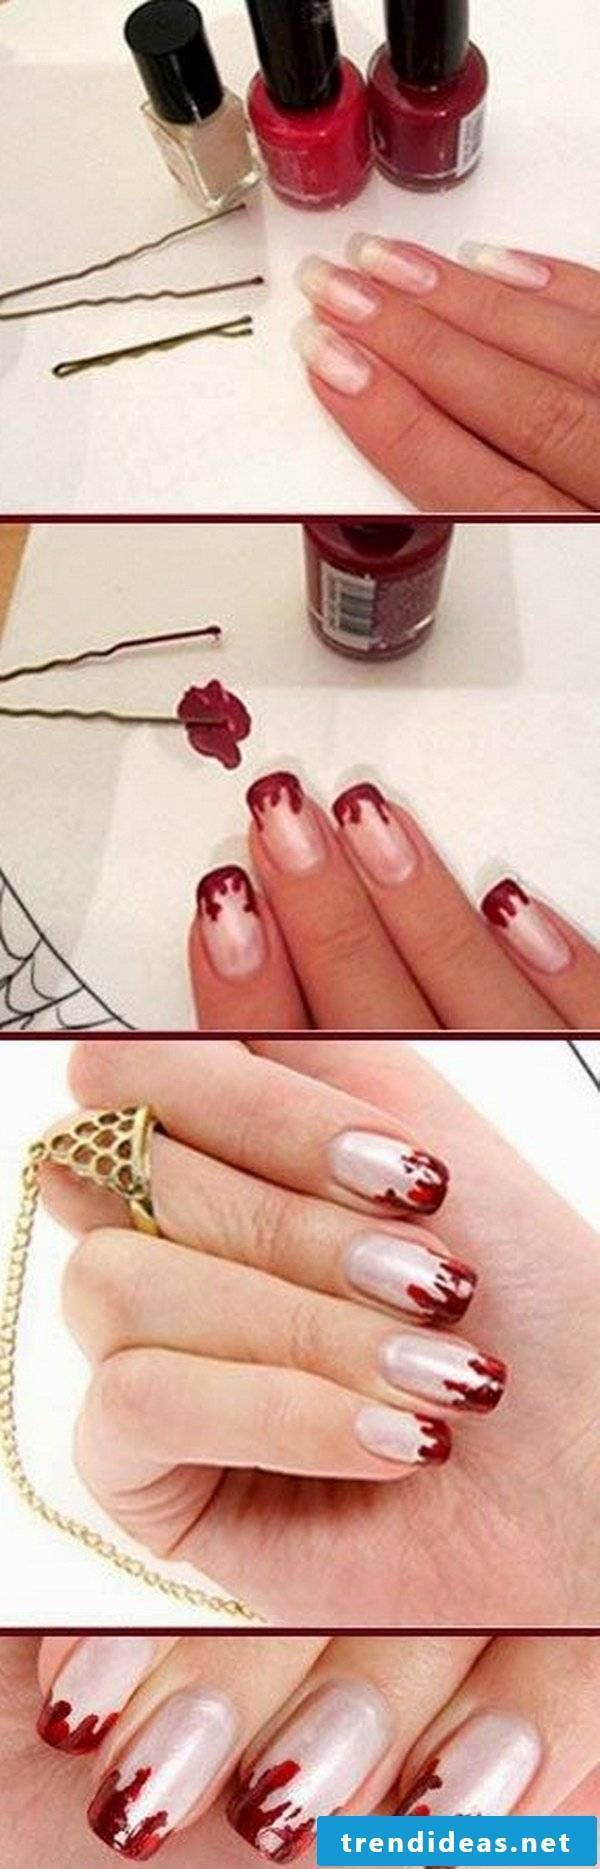 Halloween Nails DIY Instructions